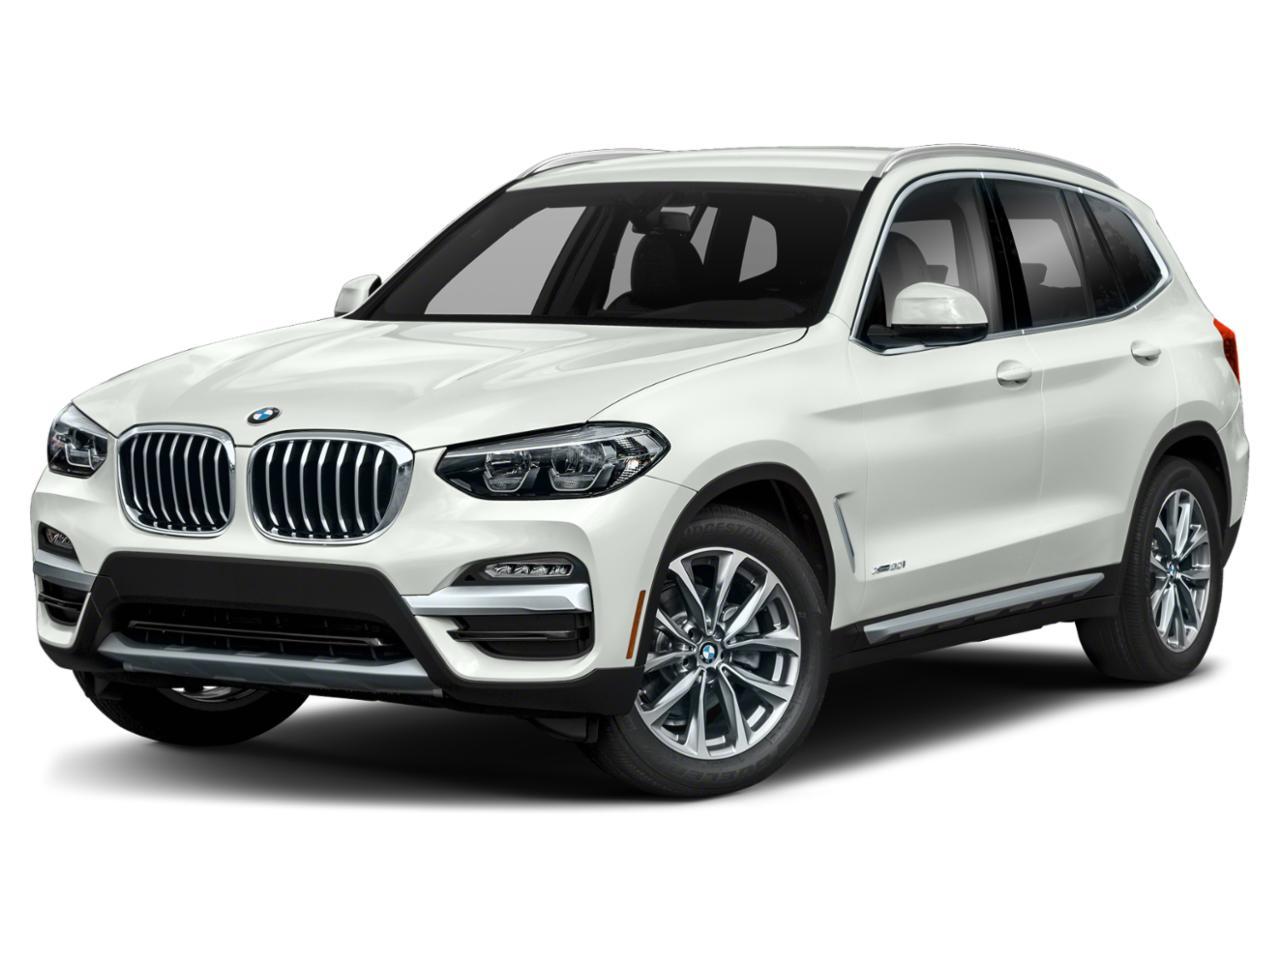 2021 BMW X3 sDrive30i Vehicle Photo in Grapevine, TX 76051